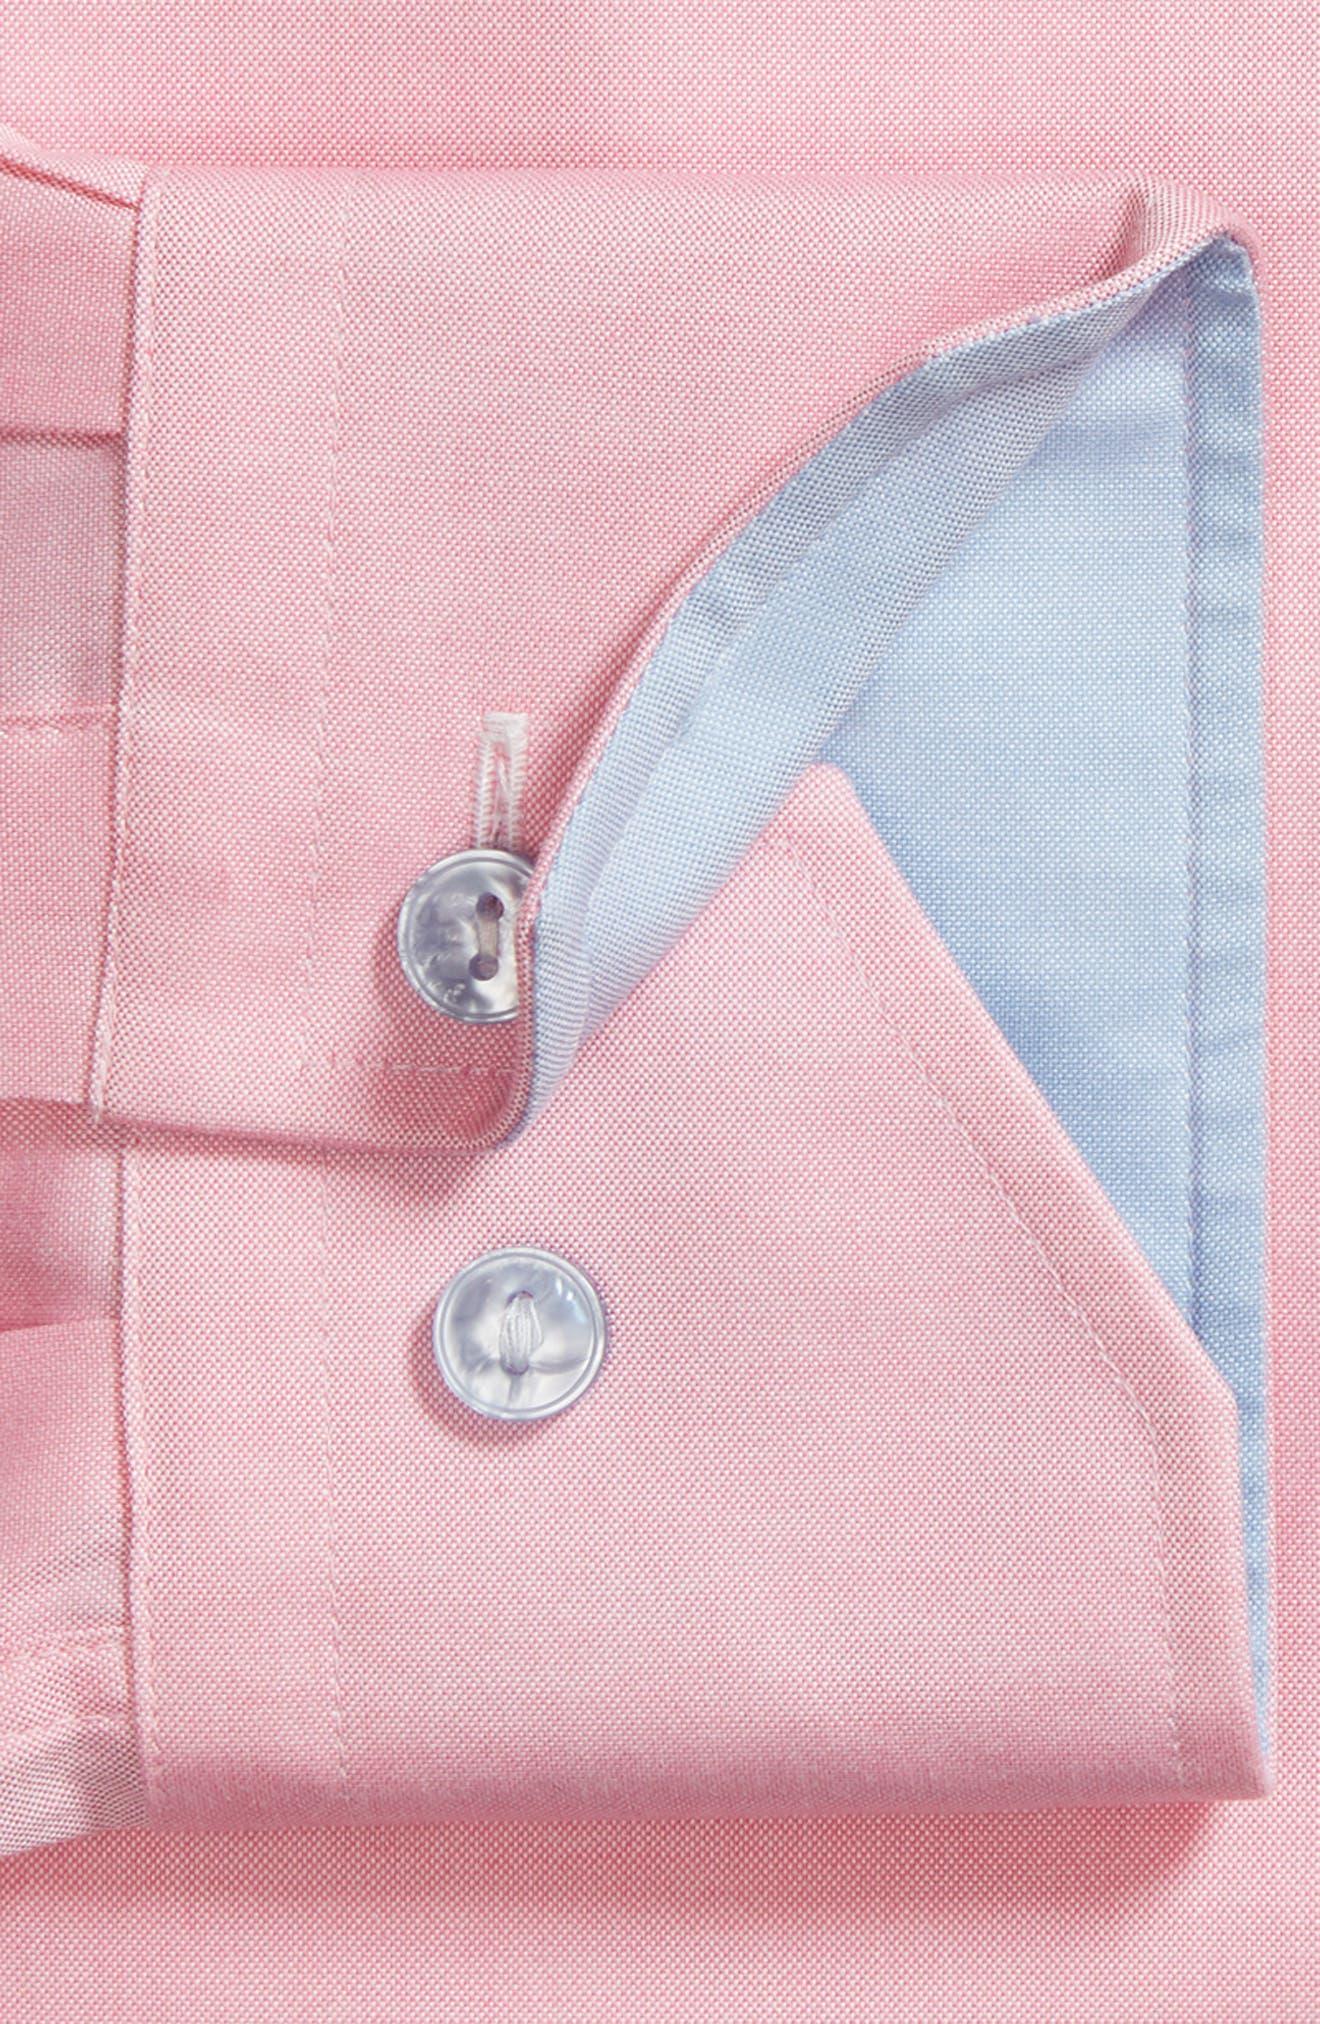 Trim Fit Oxford Dress Shirt,                             Alternate thumbnail 5, color,                             Pink